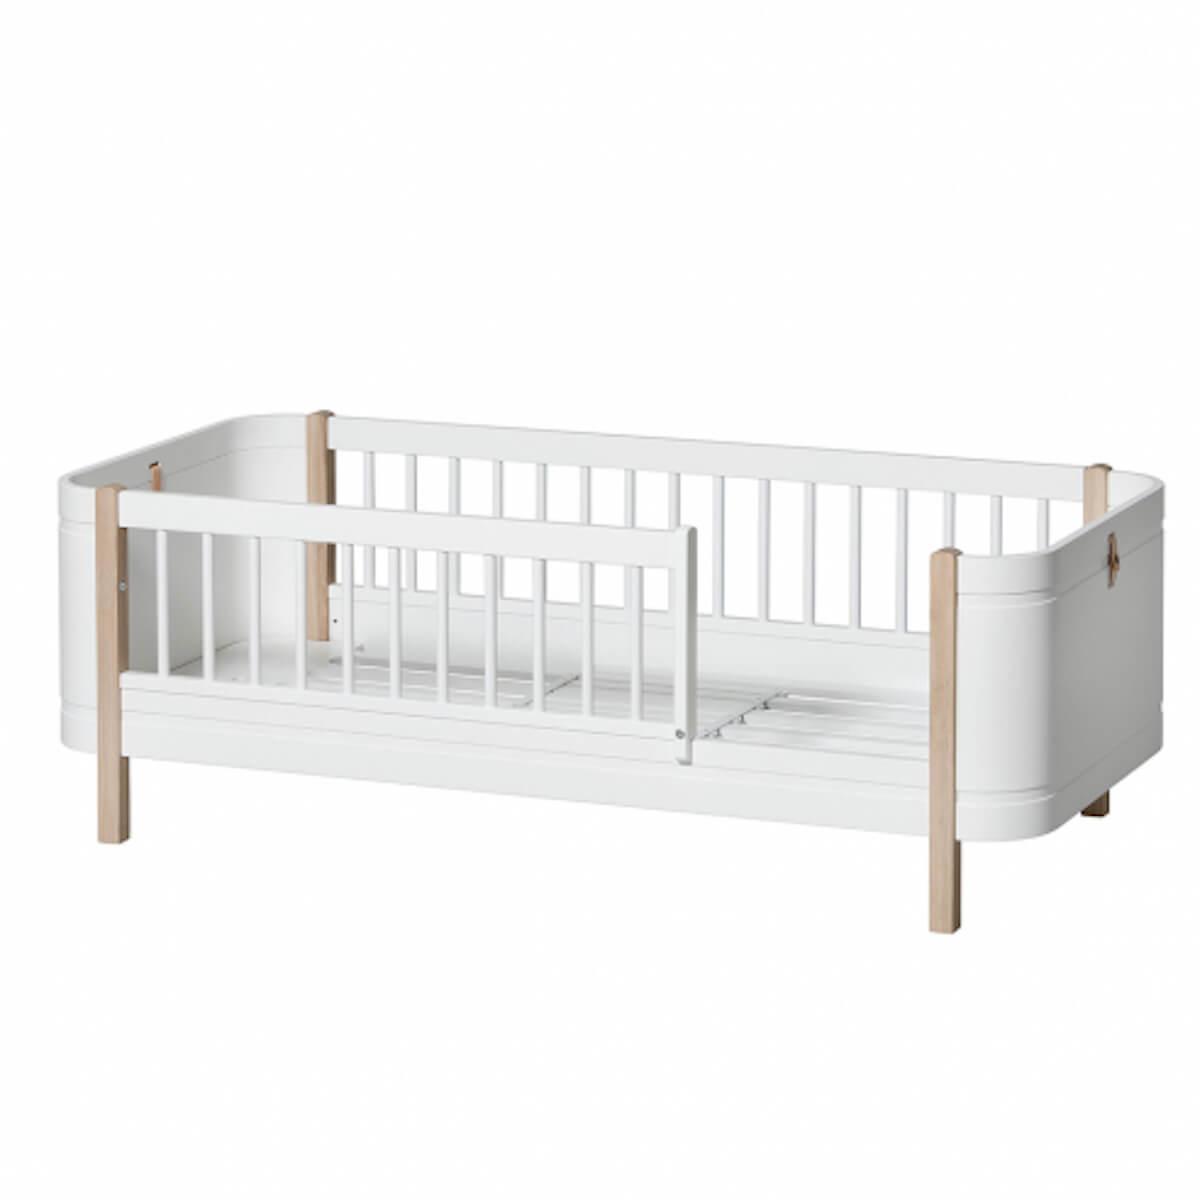 Lit junior 68x162cm MINI+ Oliver Furniture chêne-blanc